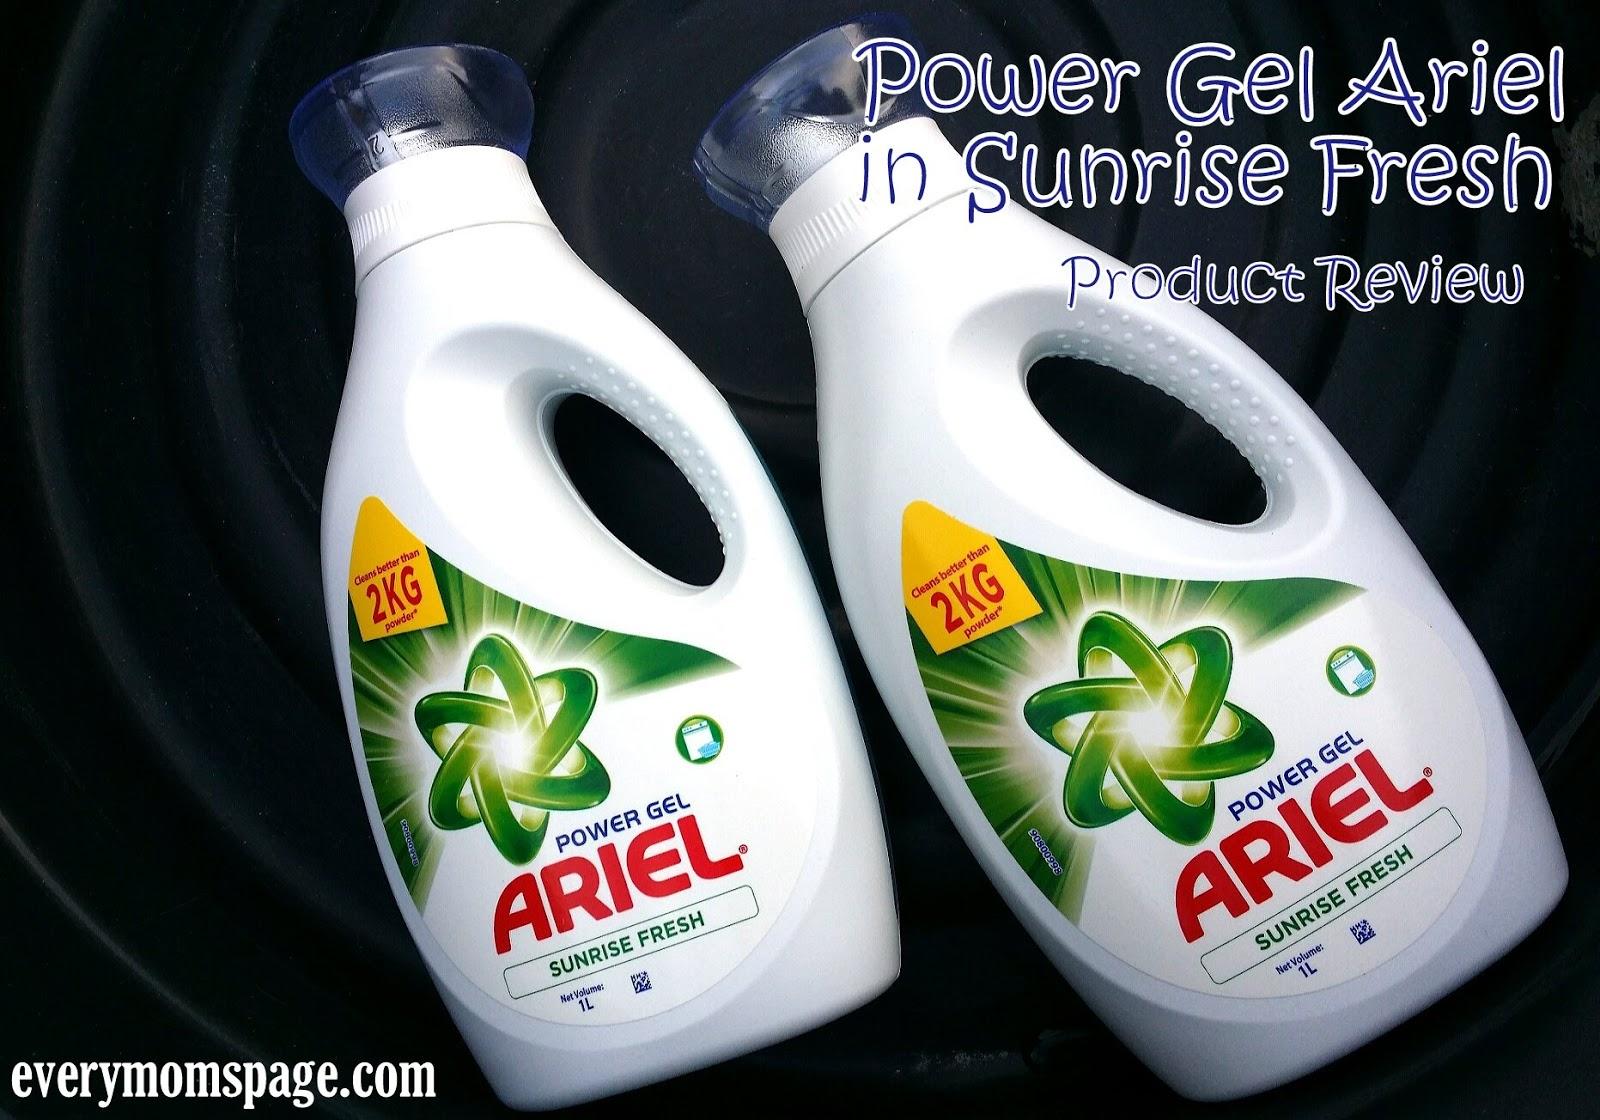 EveryMom'sPage: Power Gel Ariel in Sunrise Fresh Review